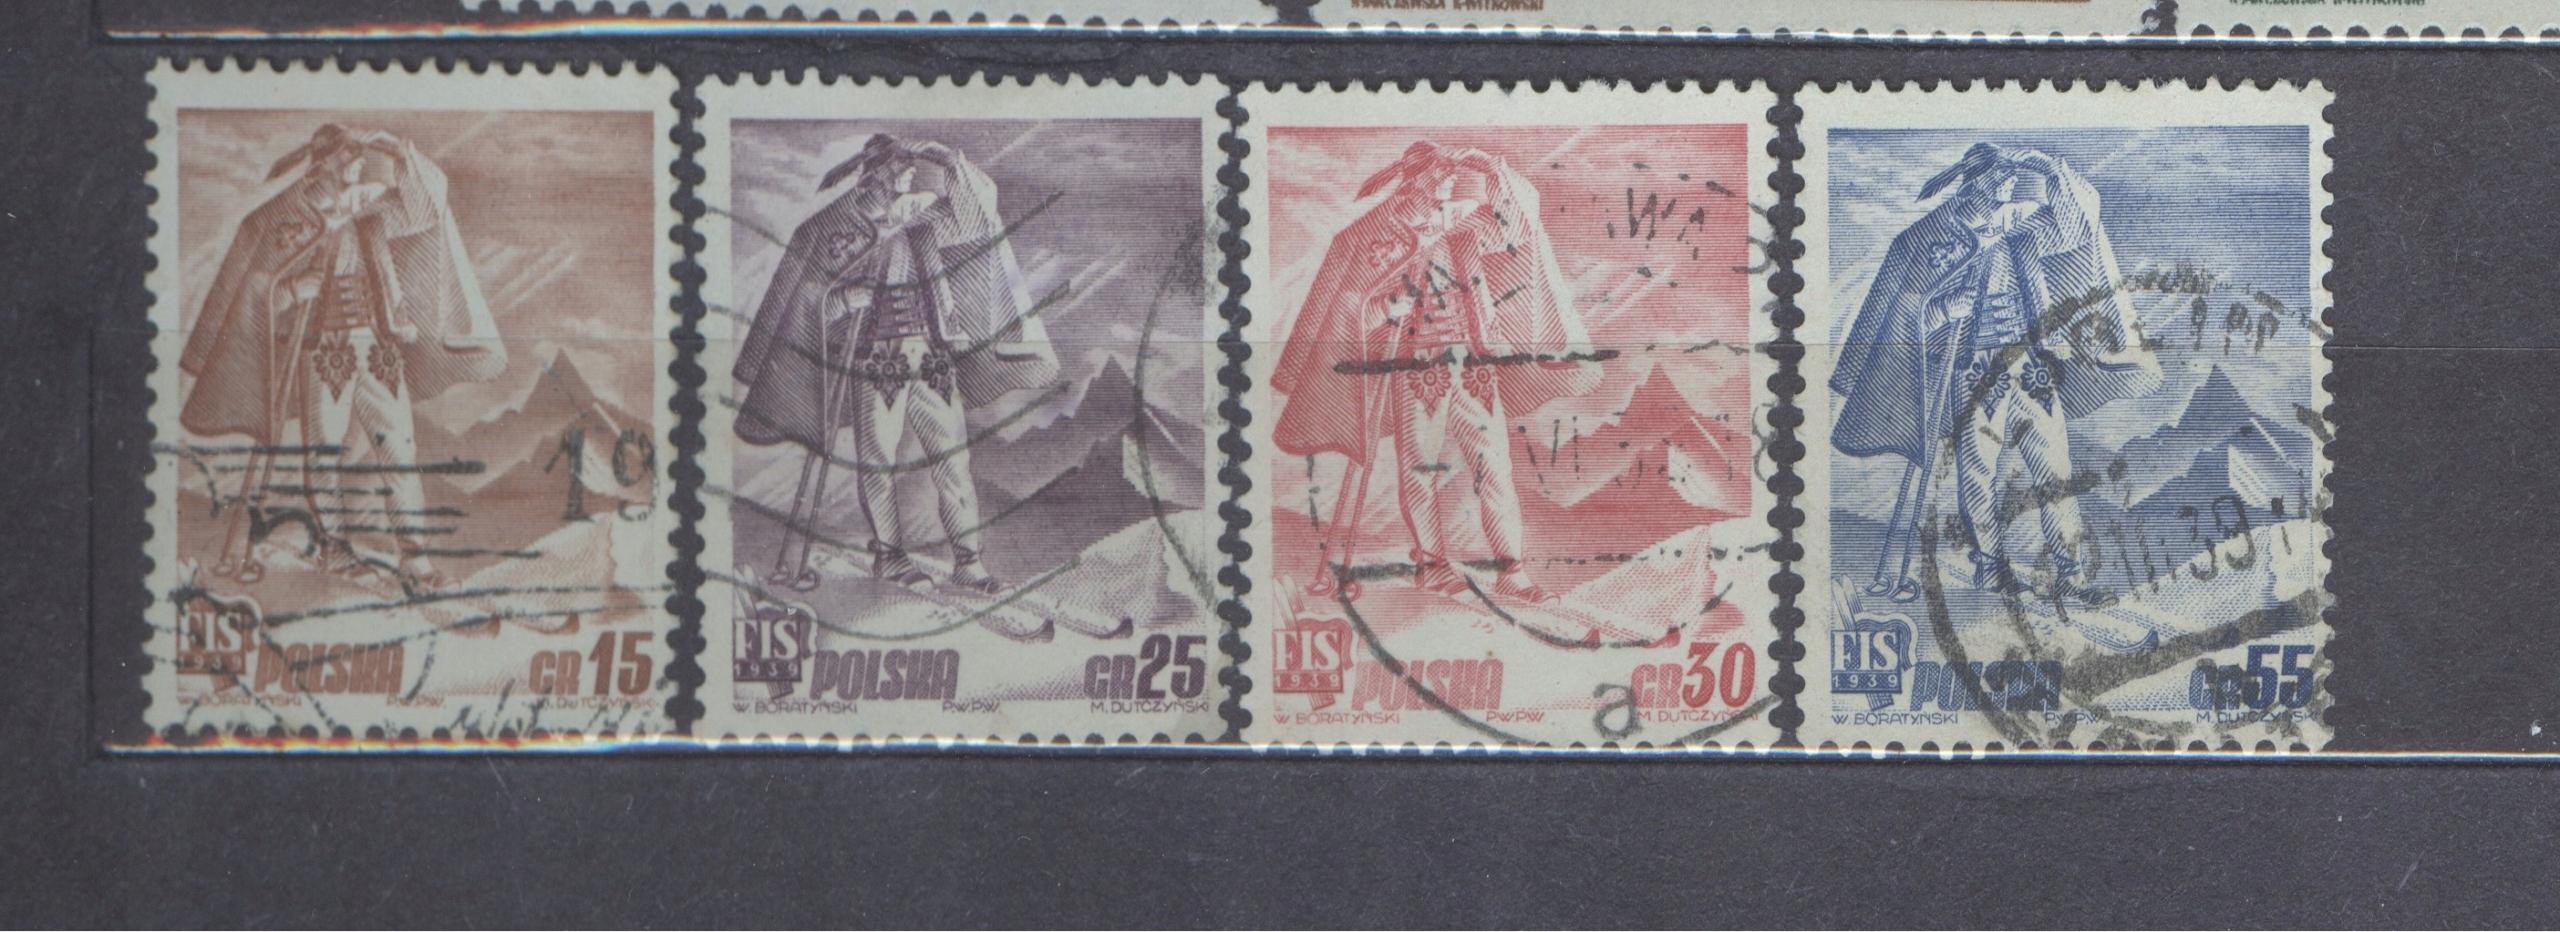 KASOWANY POLSKA - Fi 330-333